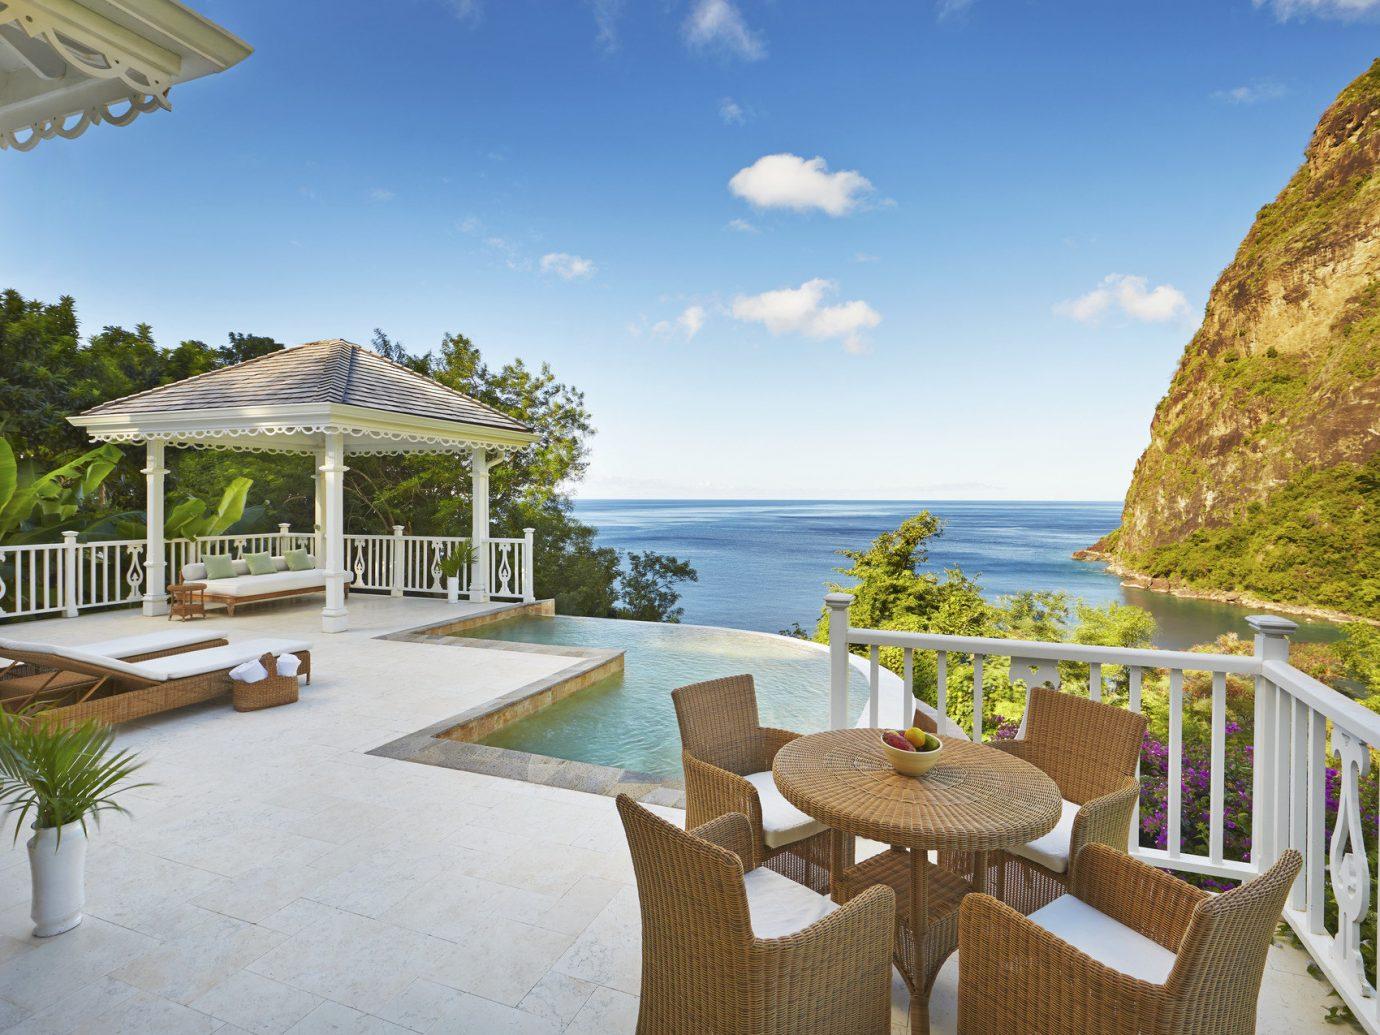 Pool And Patio At Grand Luxury Villa At Viceroy Resort In Sugar Beach